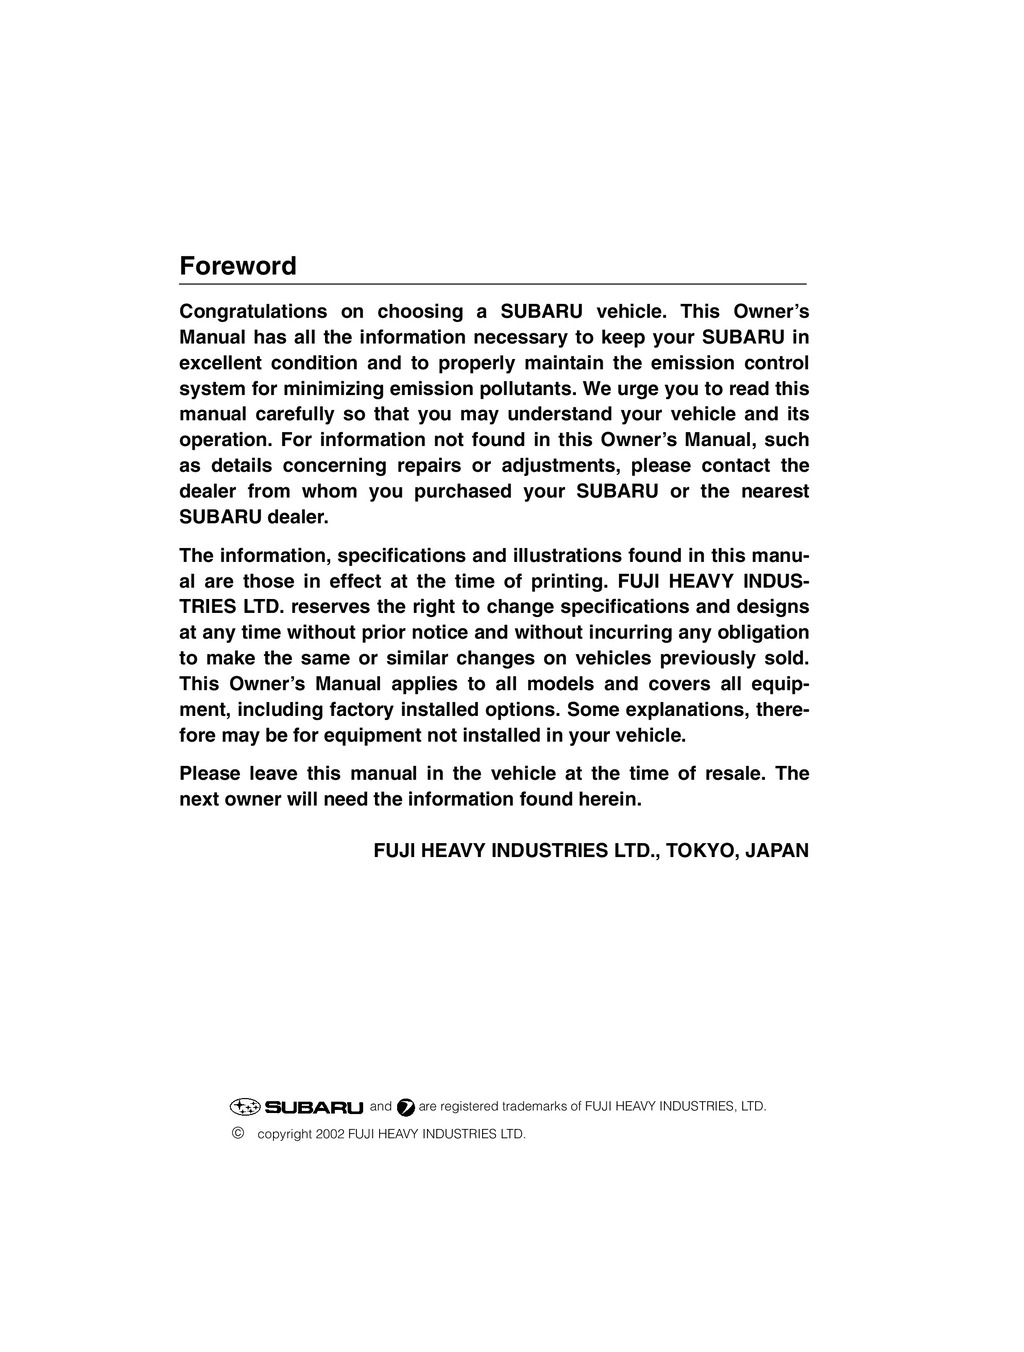 2003 Subaru Baja owners manual